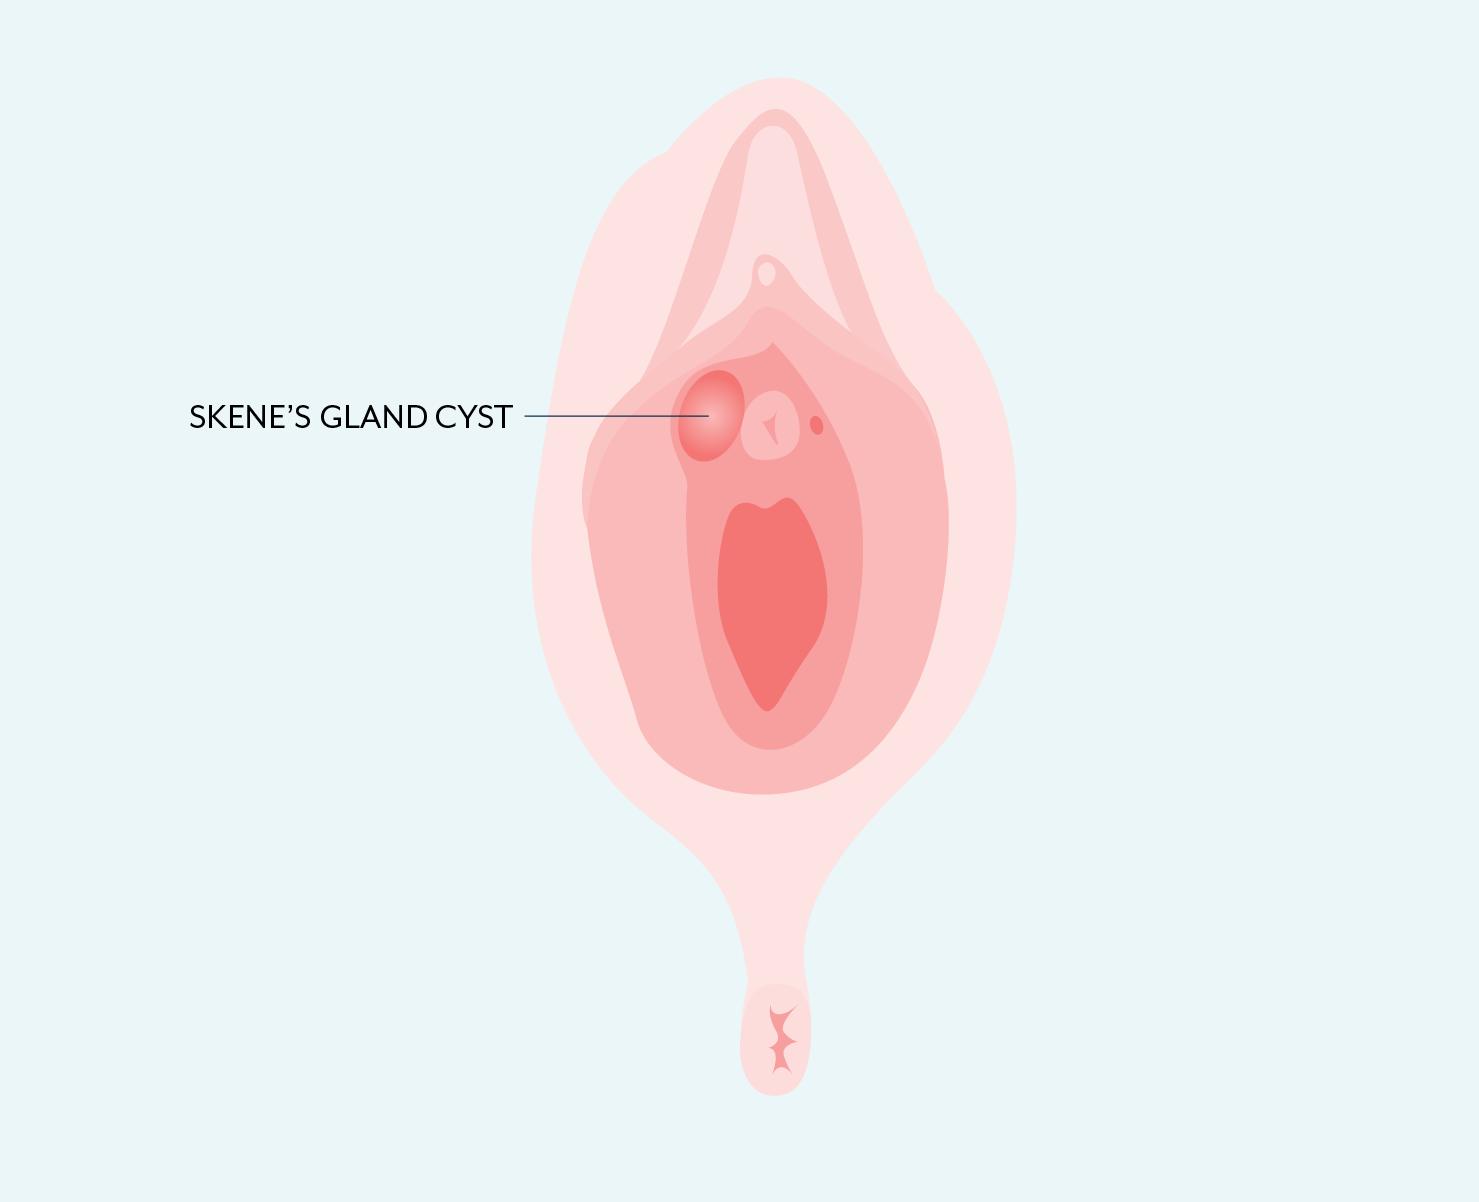 Skene's gland cyst